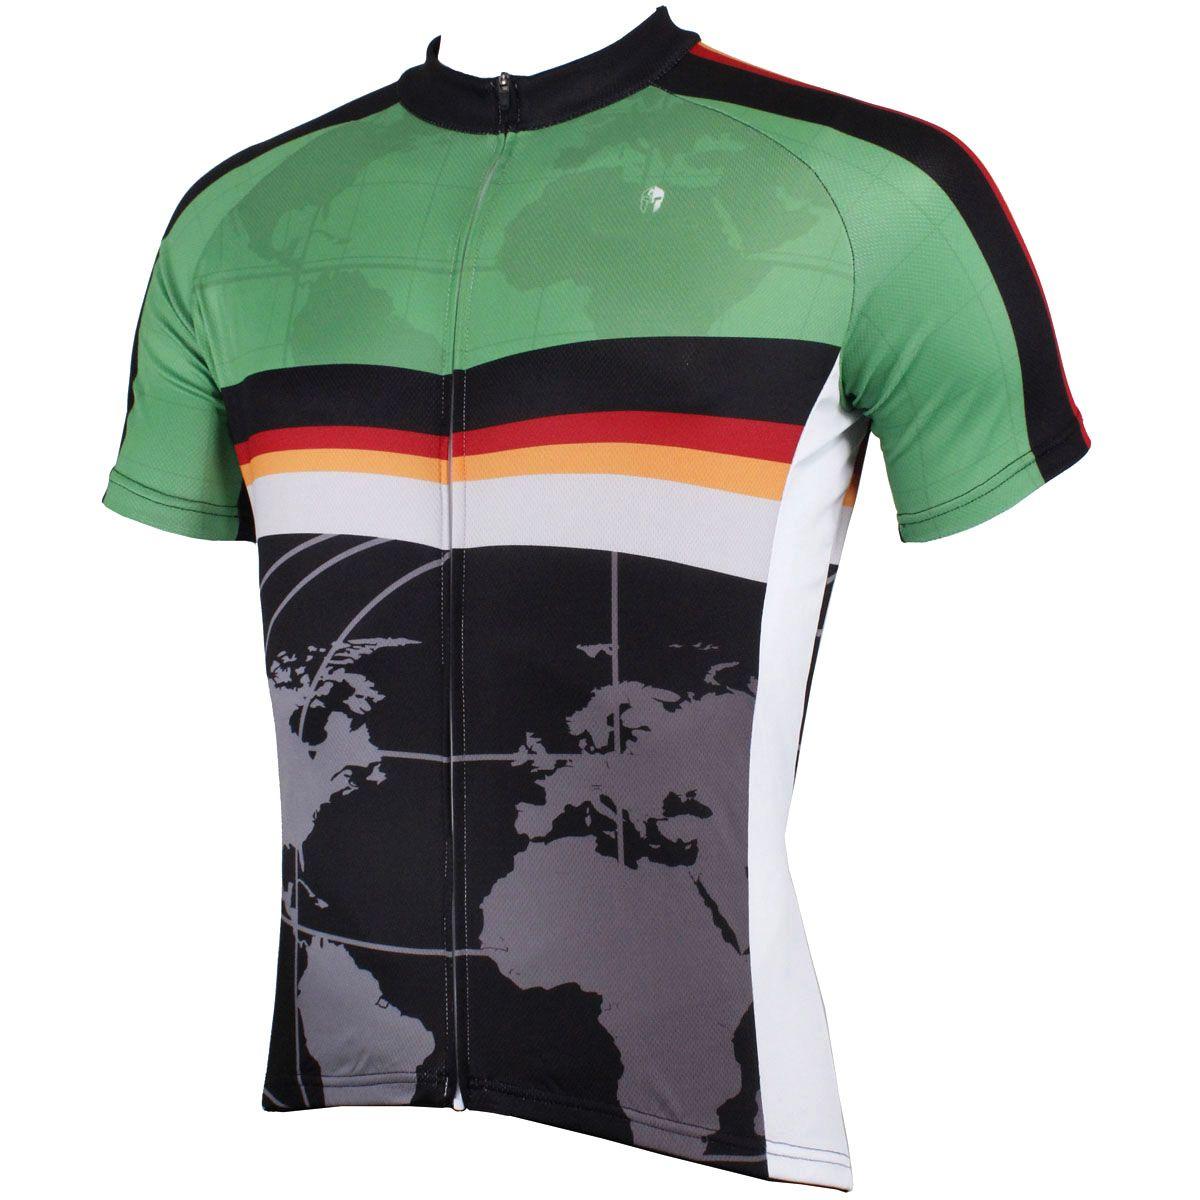 Final Clearance Sale Mens Cycling Jersey Short Sleeve Bike Wear Sports Shirt Top